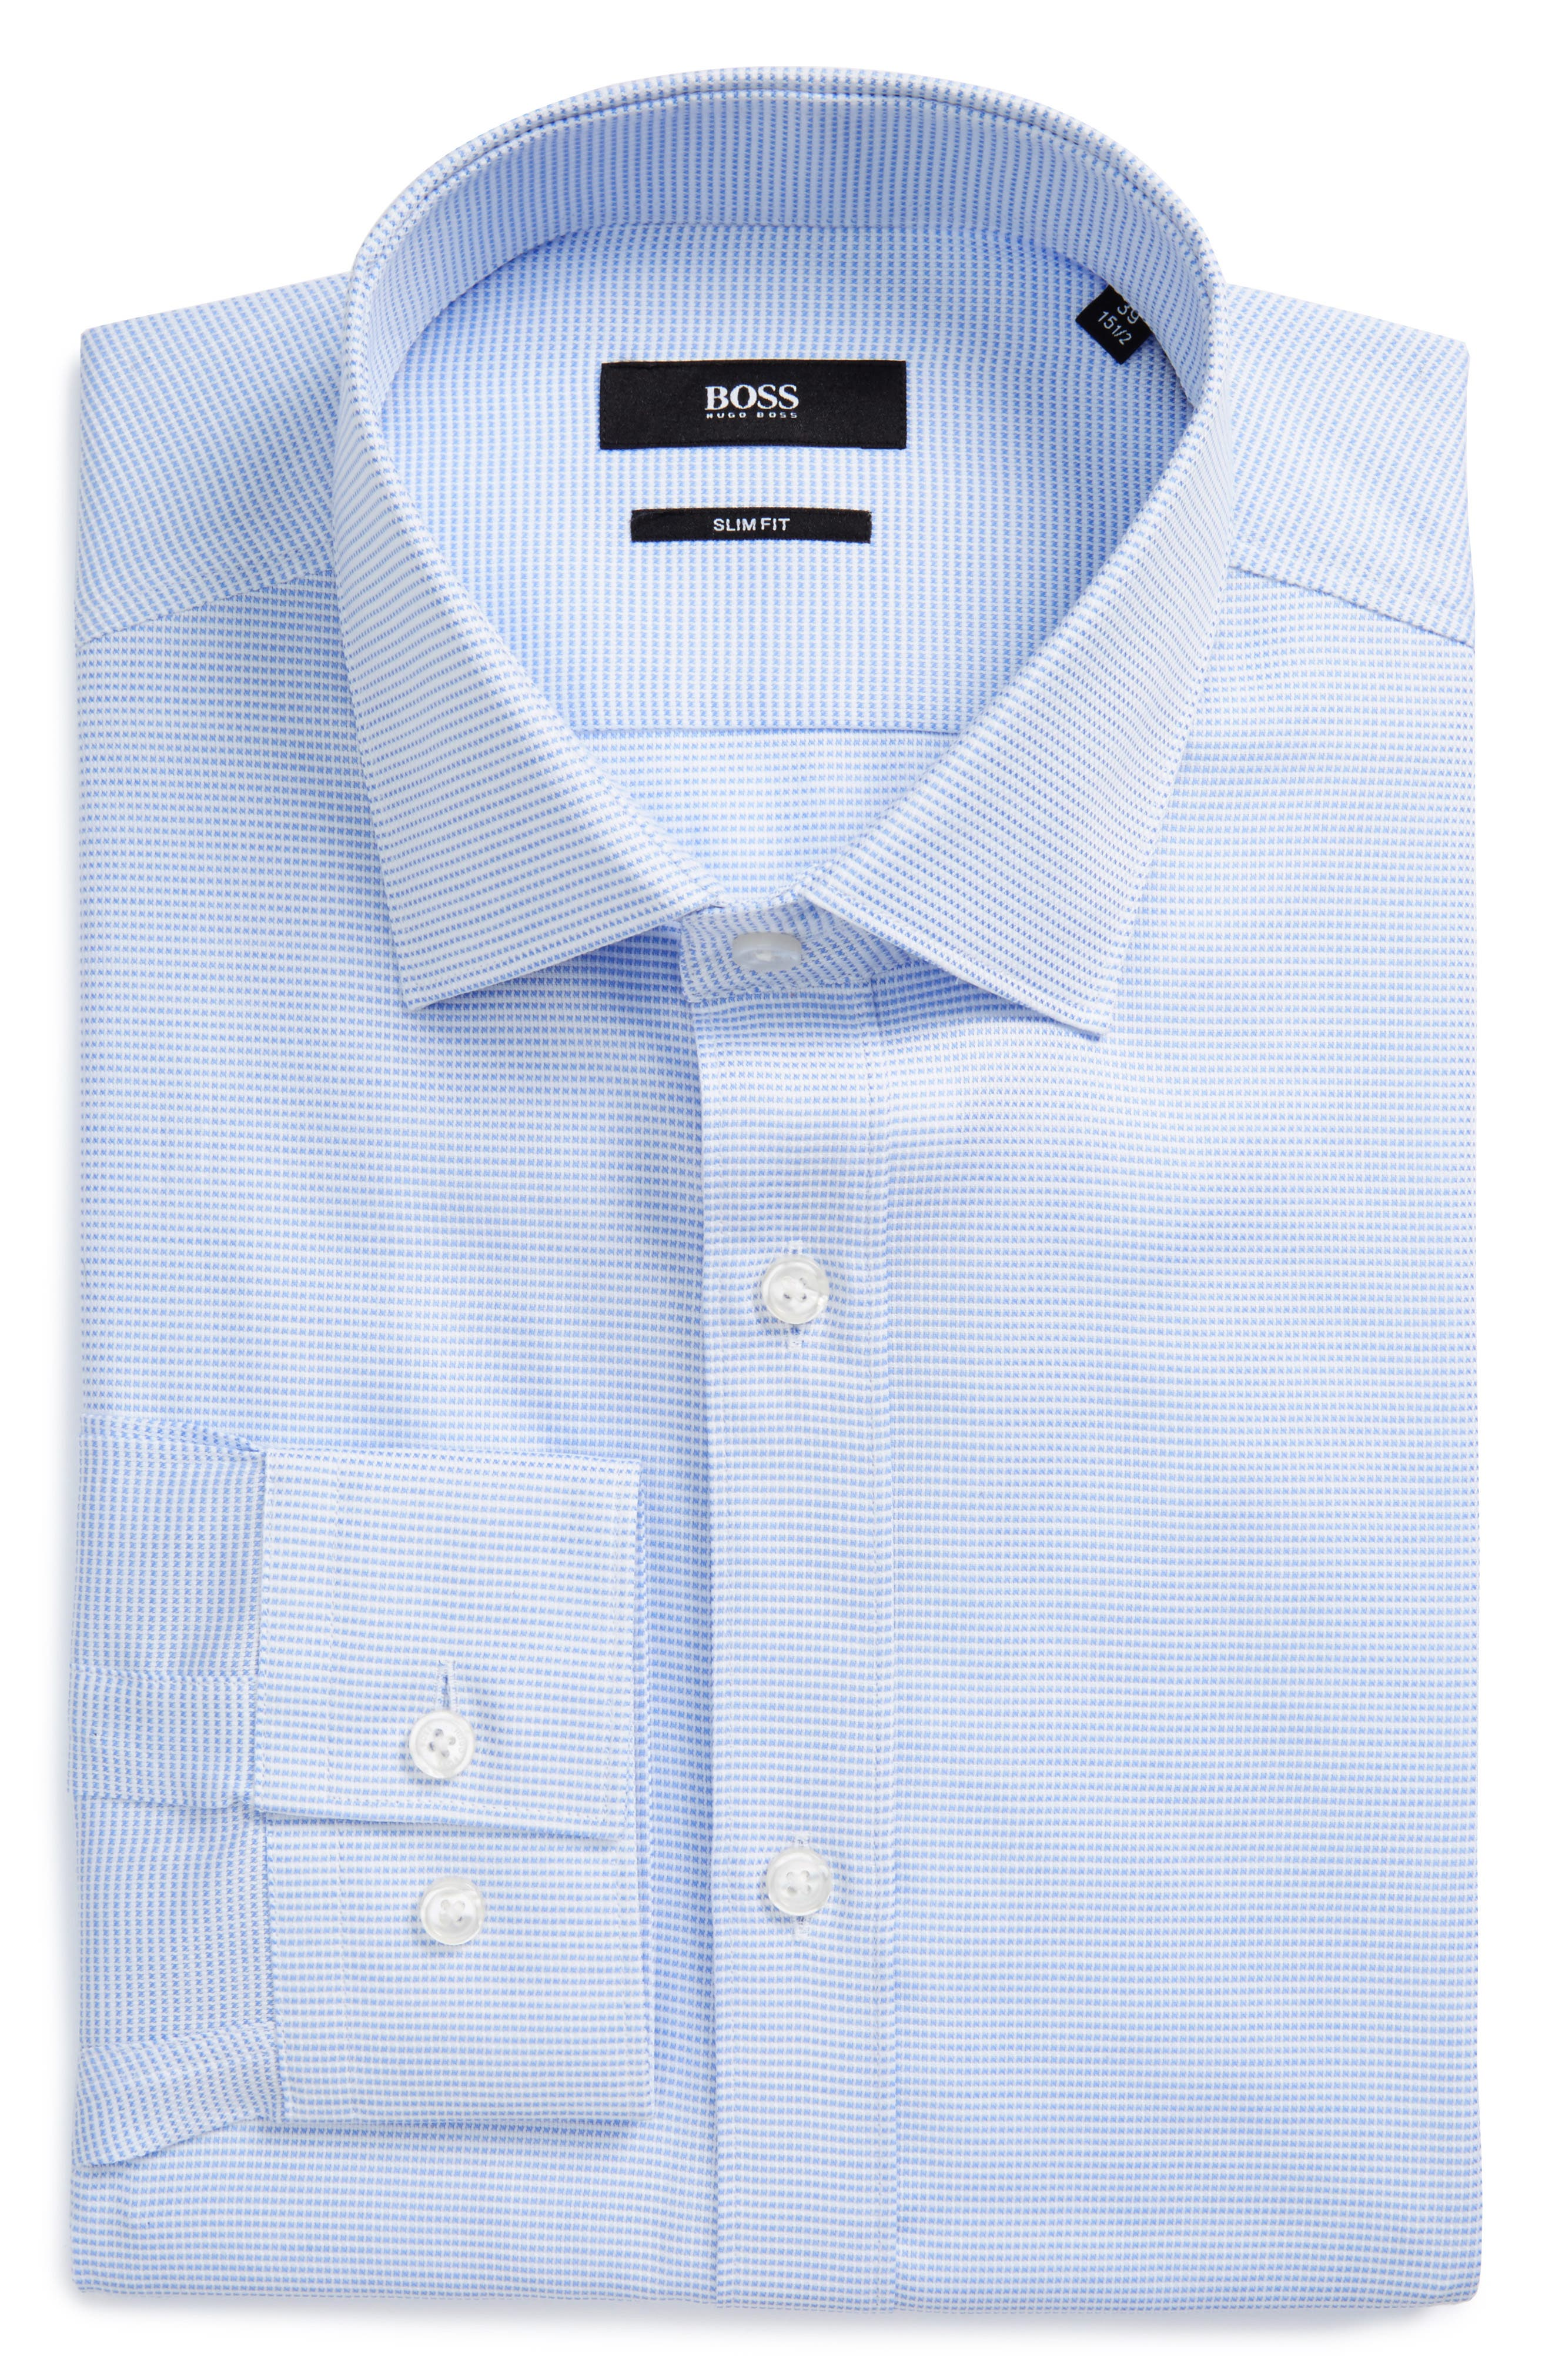 Main Image - BOSS Issak Slim Fit Check Dress Shirt